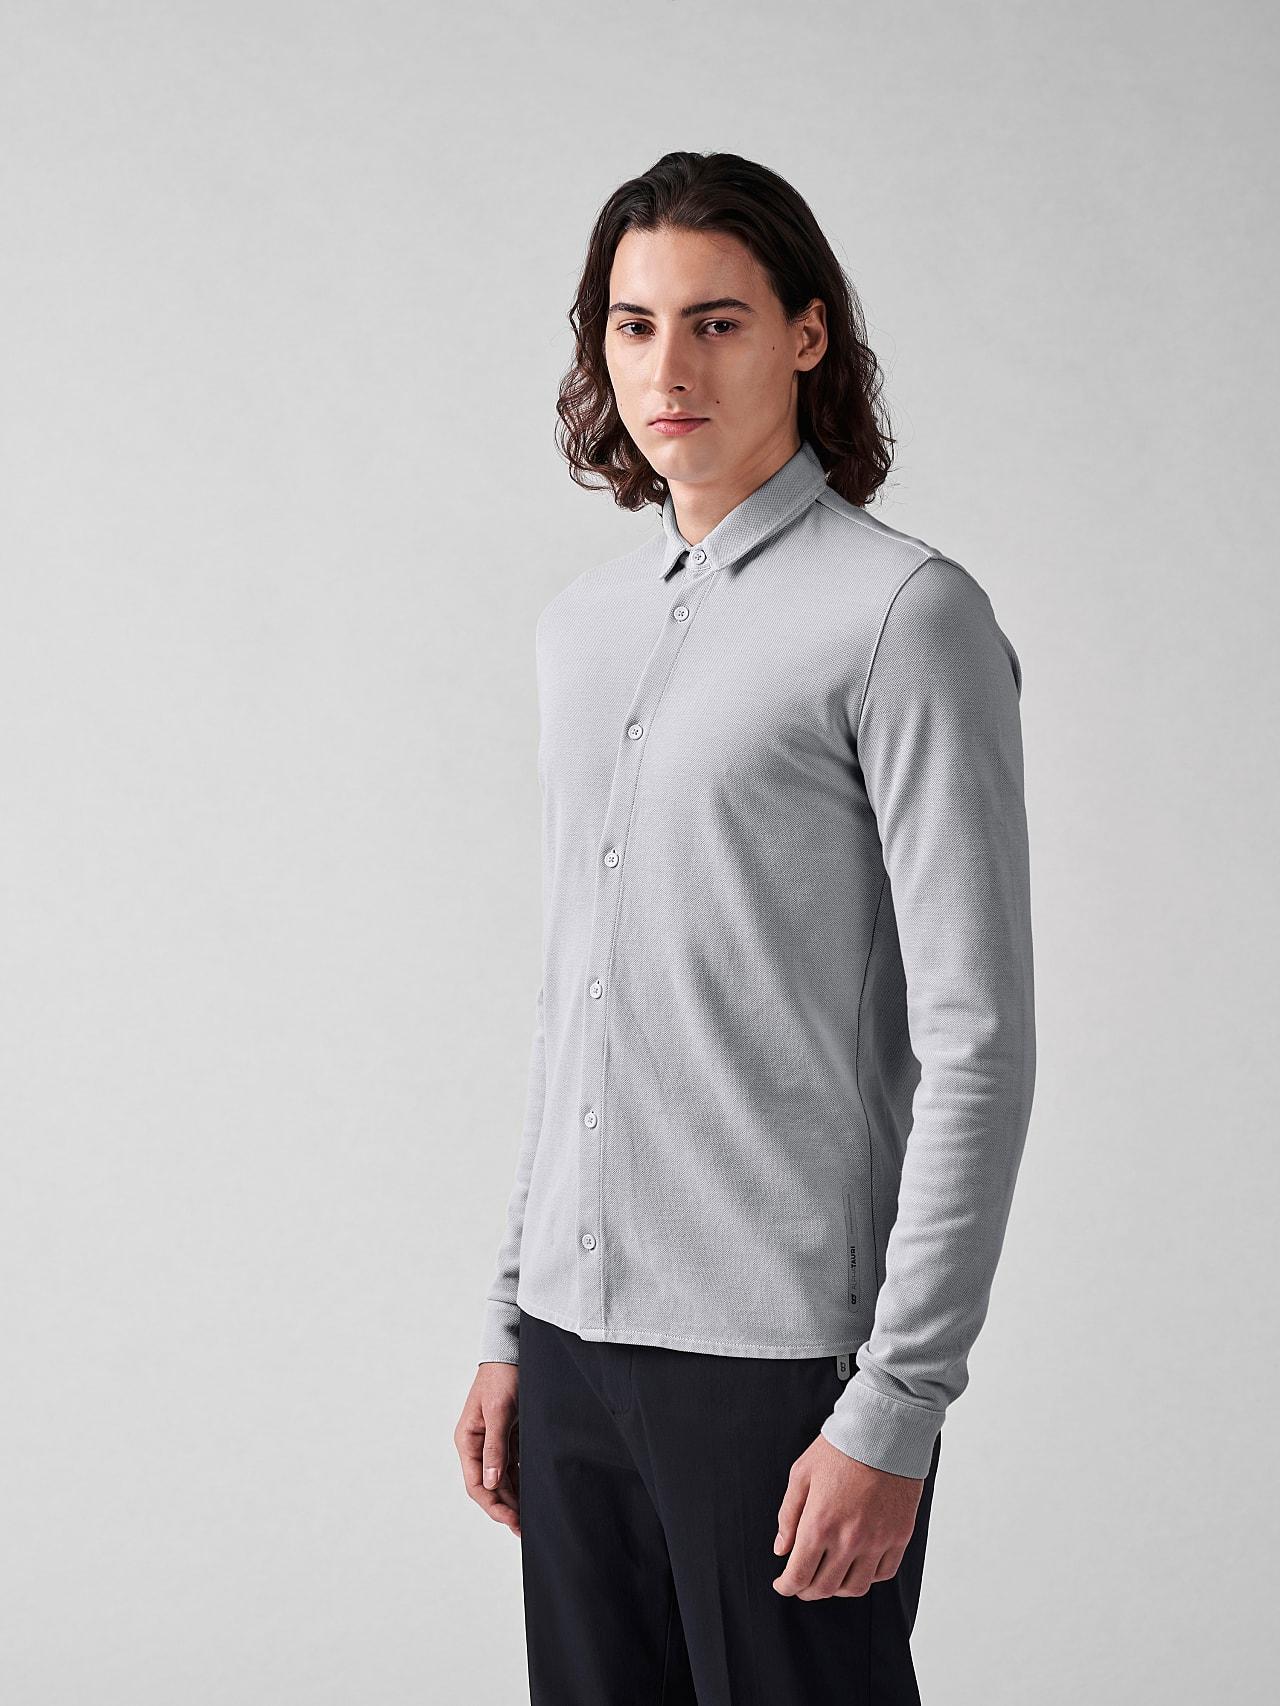 JIQUE V1.Y5.01 Pique Shirt with Kent Collar light grey Model shot Alpha Tauri